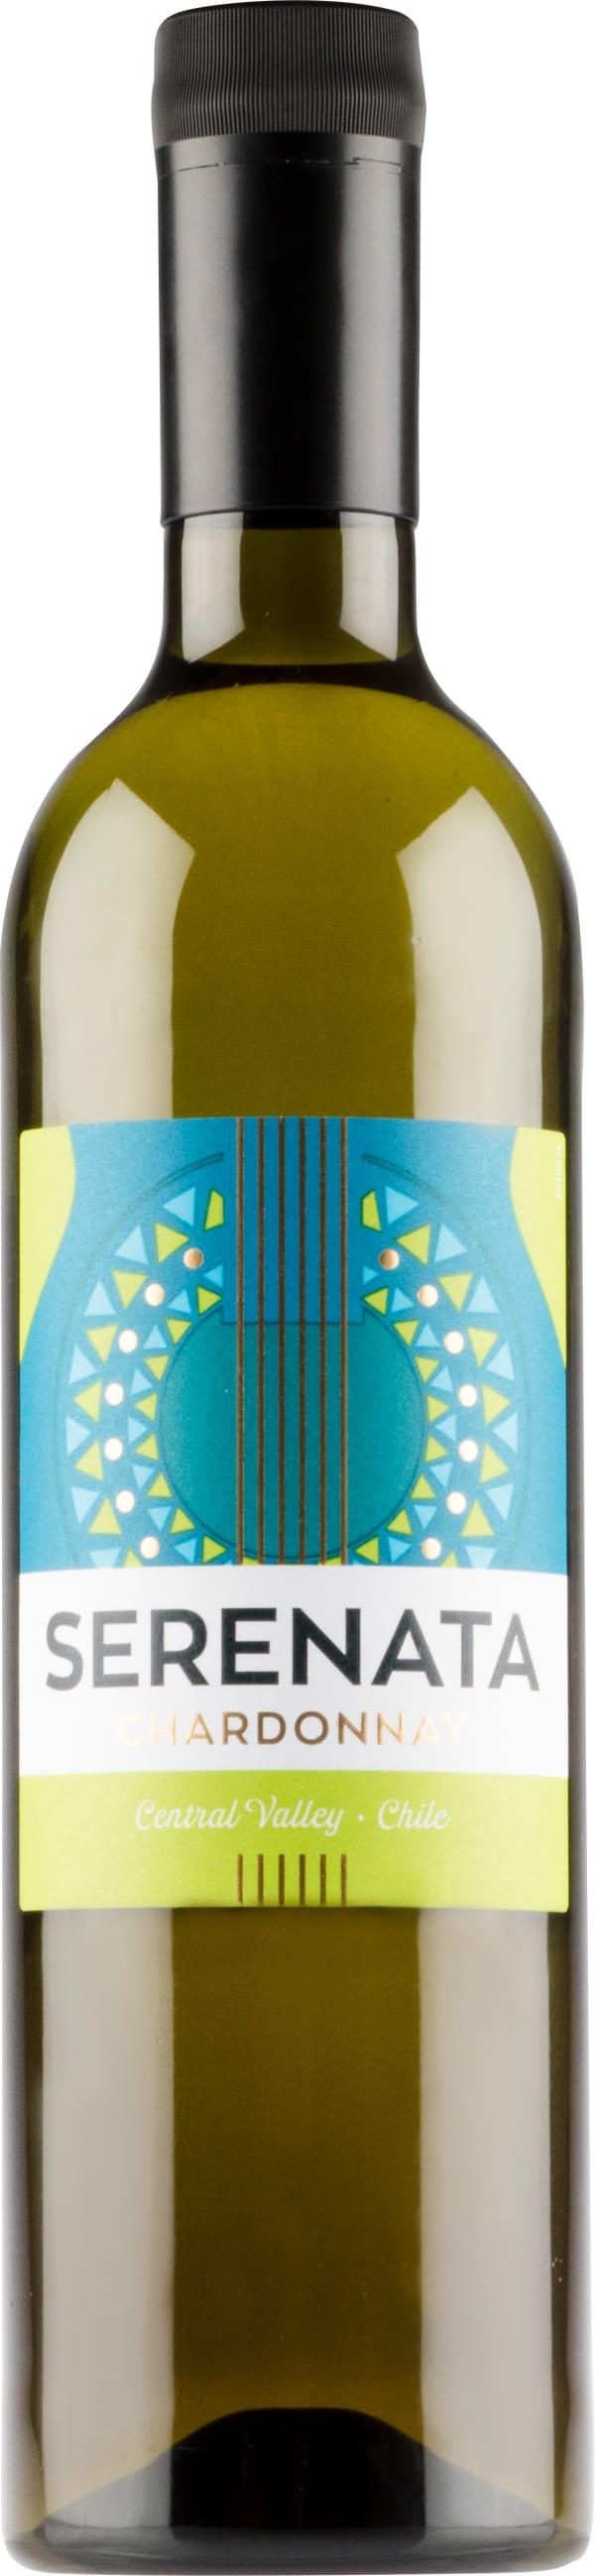 Serenata Chardonnay plastic bottle